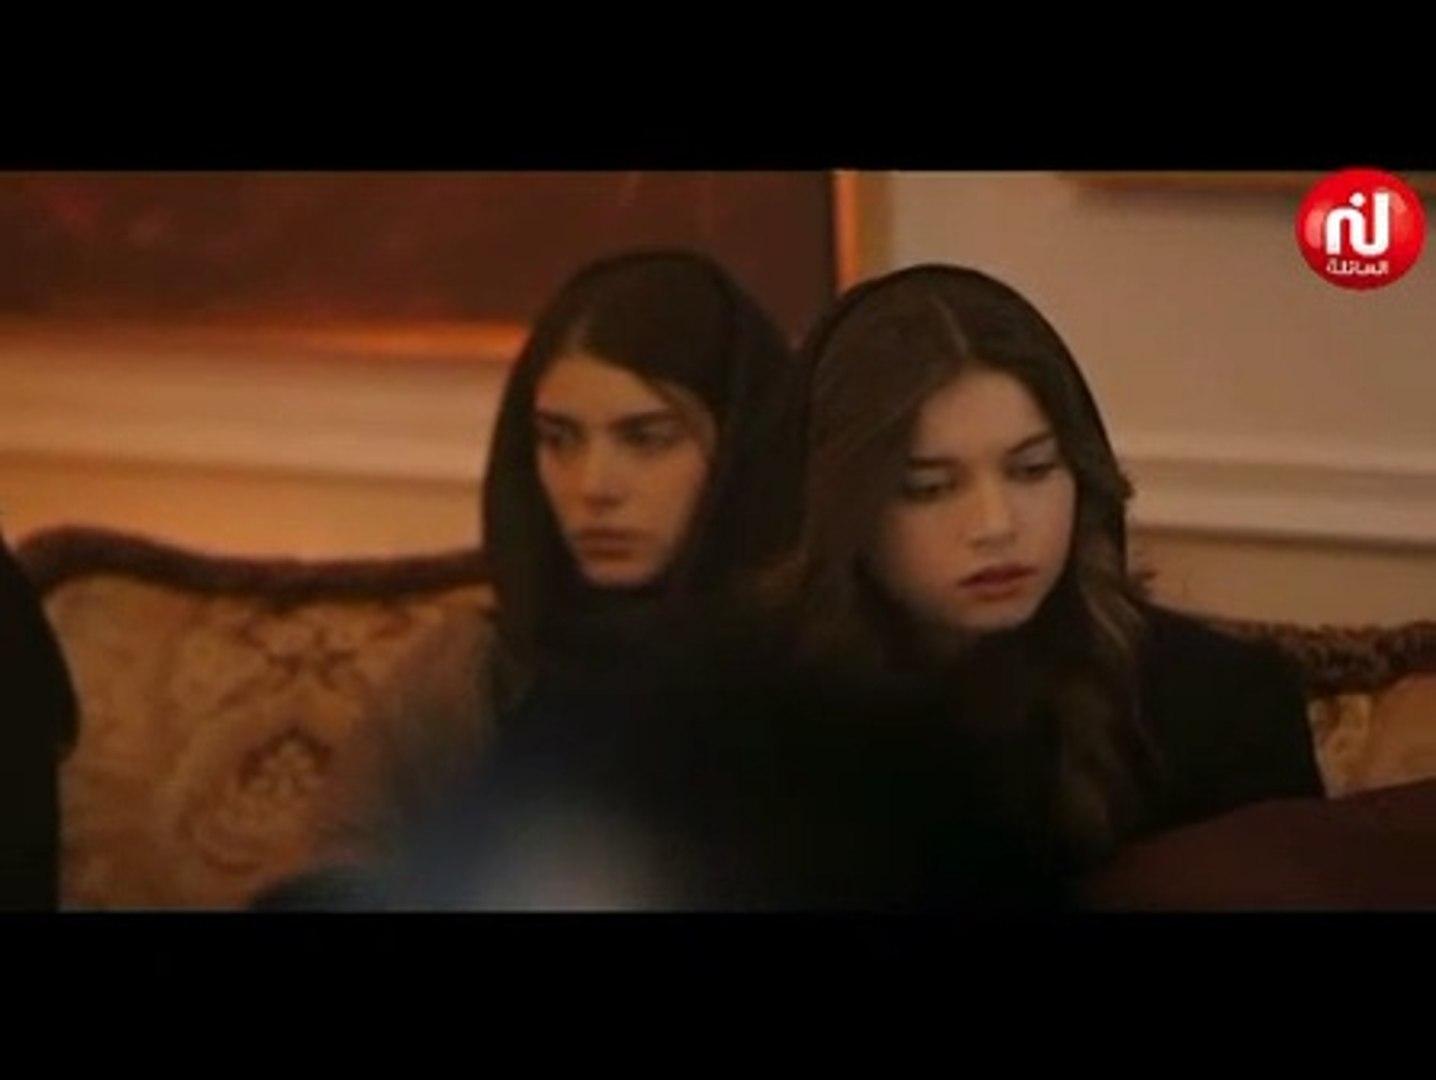 Bnet Fadhila Ep 85 Nessma مسلسل بنات فضيلة الحلقة 85 Video